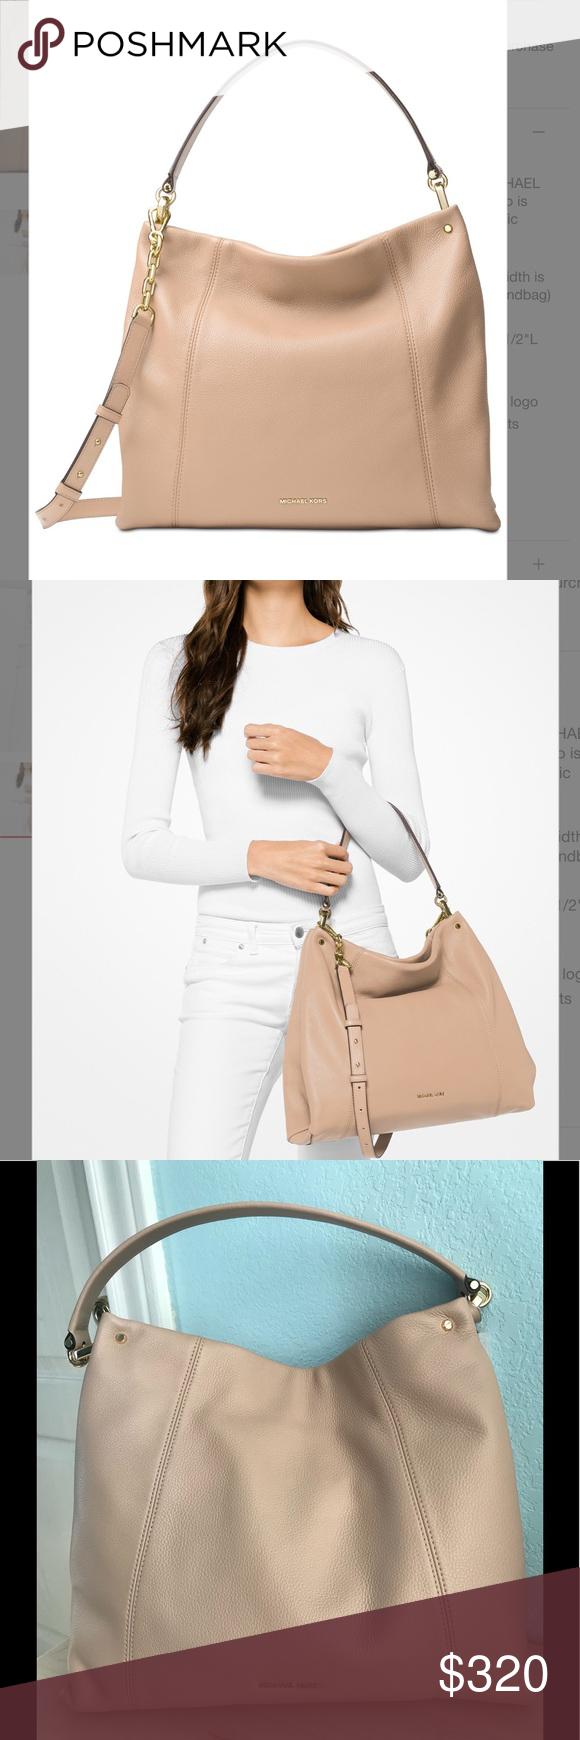 8d691c82673a NWT MICHAEL Michael Kors Lex Large Hobo bag NWT MICHAEL Michael Kors Lex  Large Hobo bag